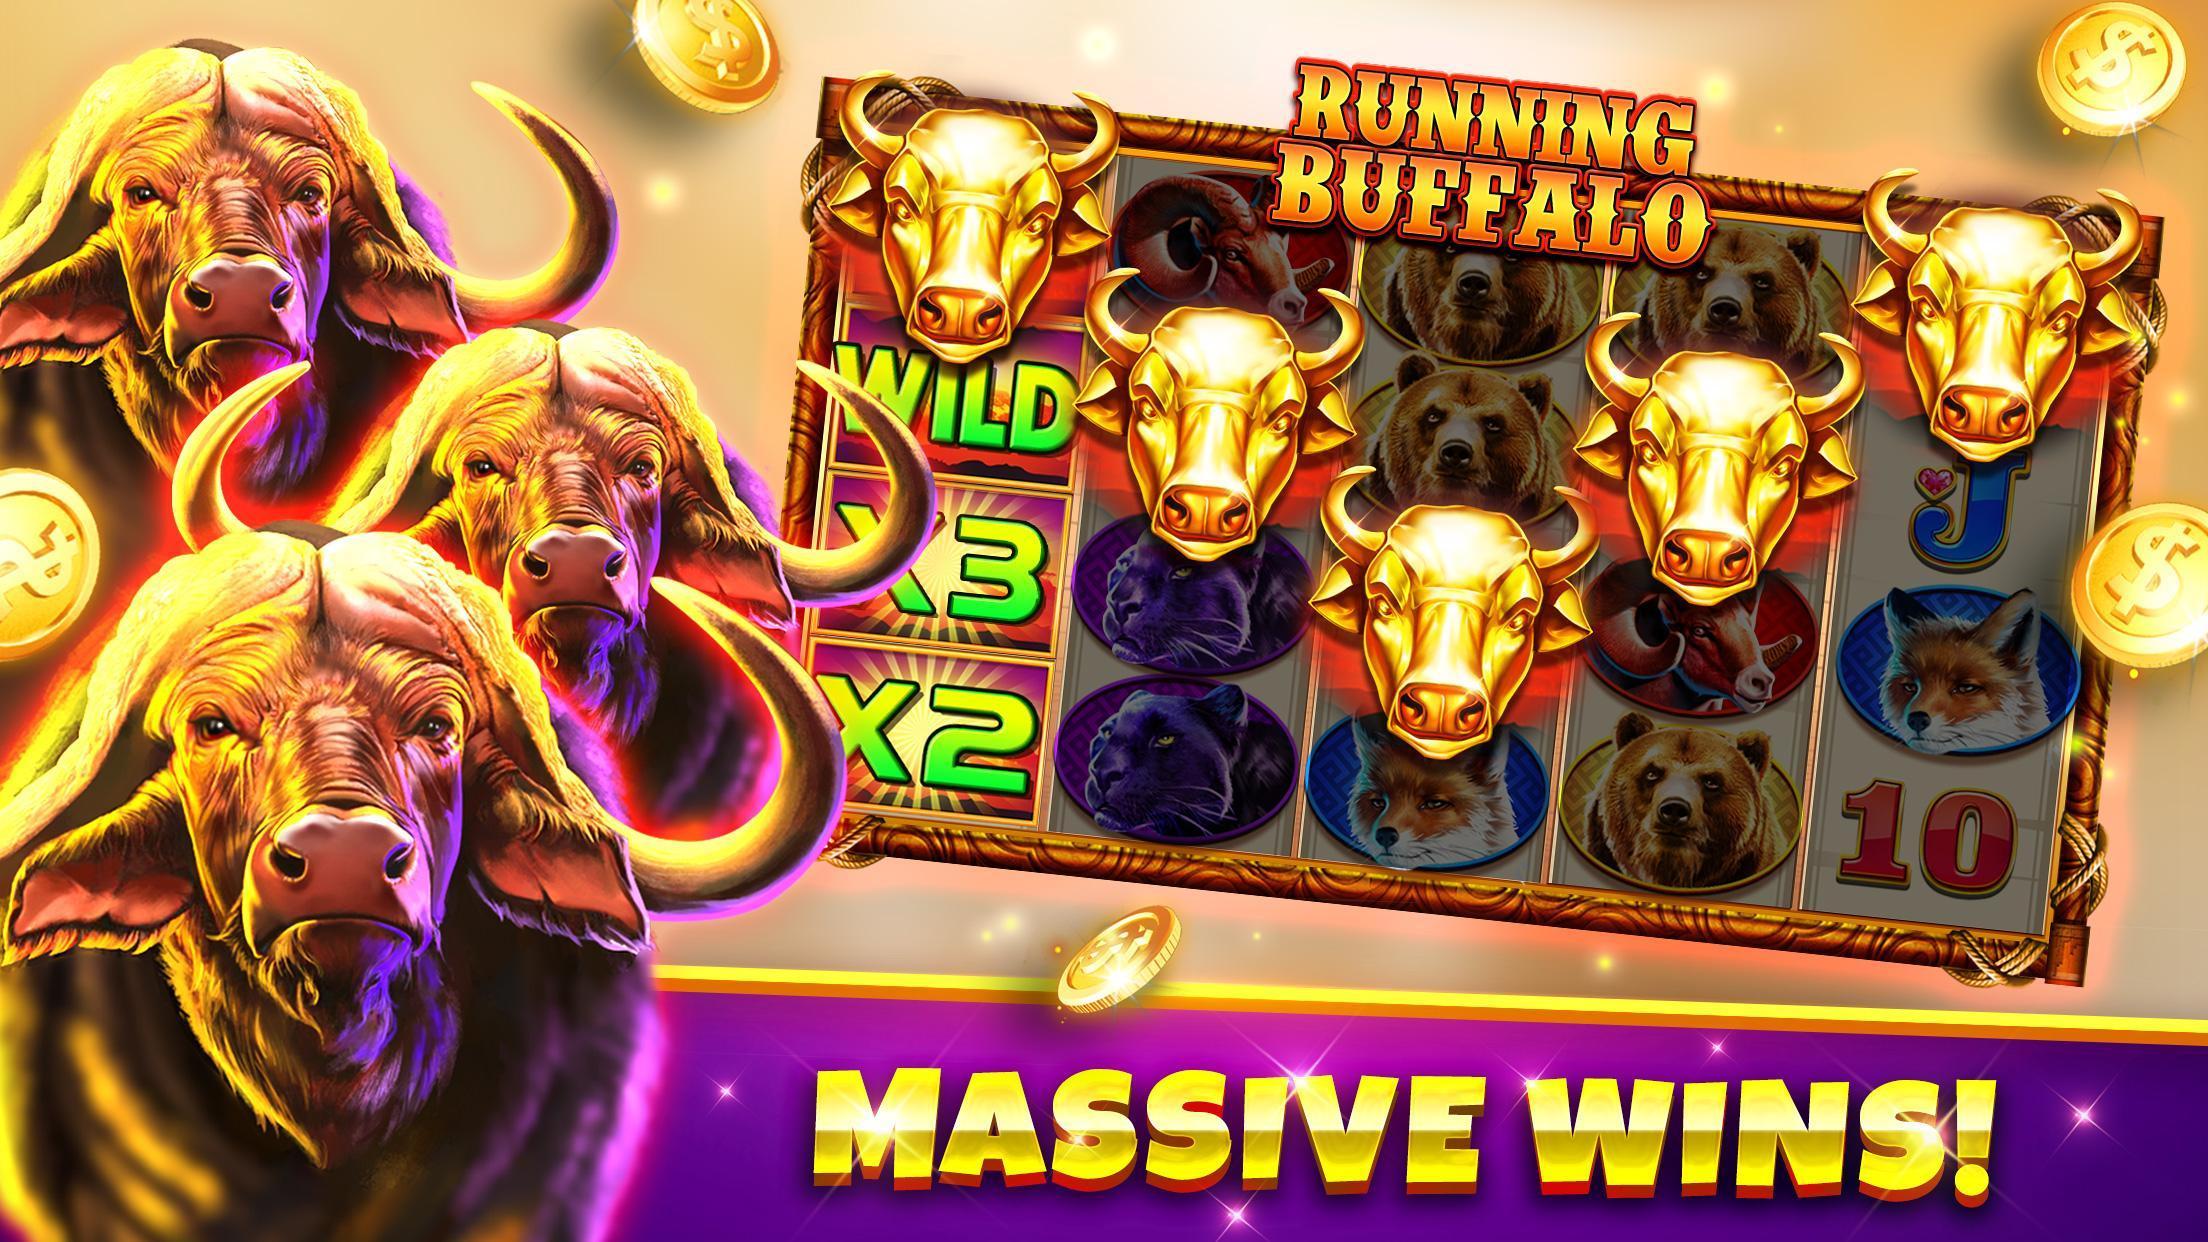 Ace casino online